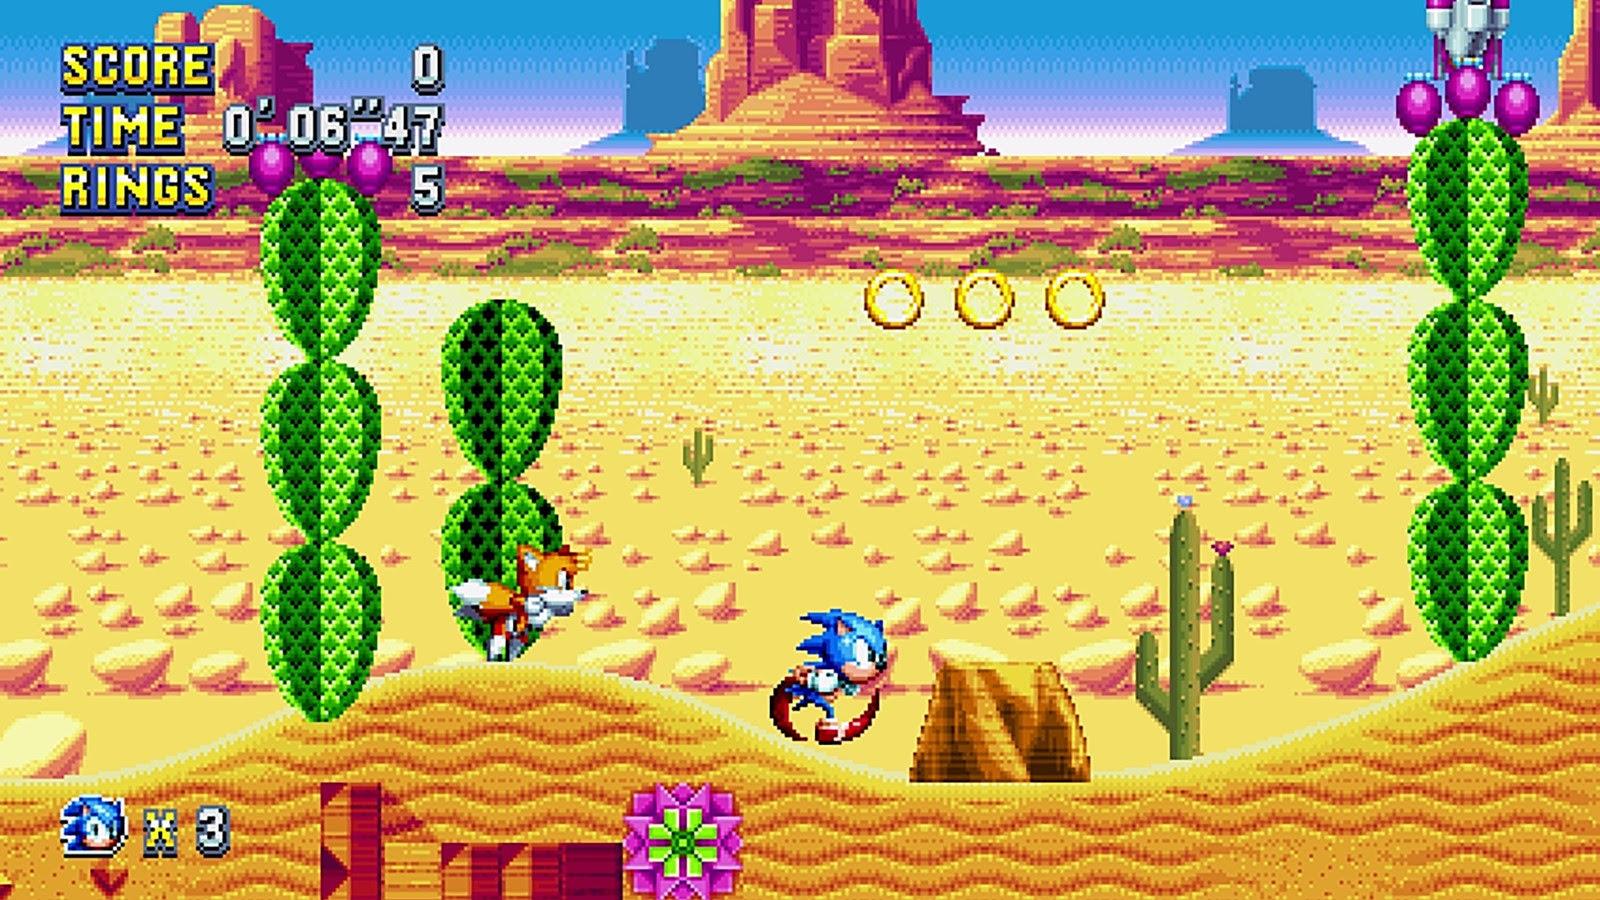 The future of Sonic the Hedgehog screenshot